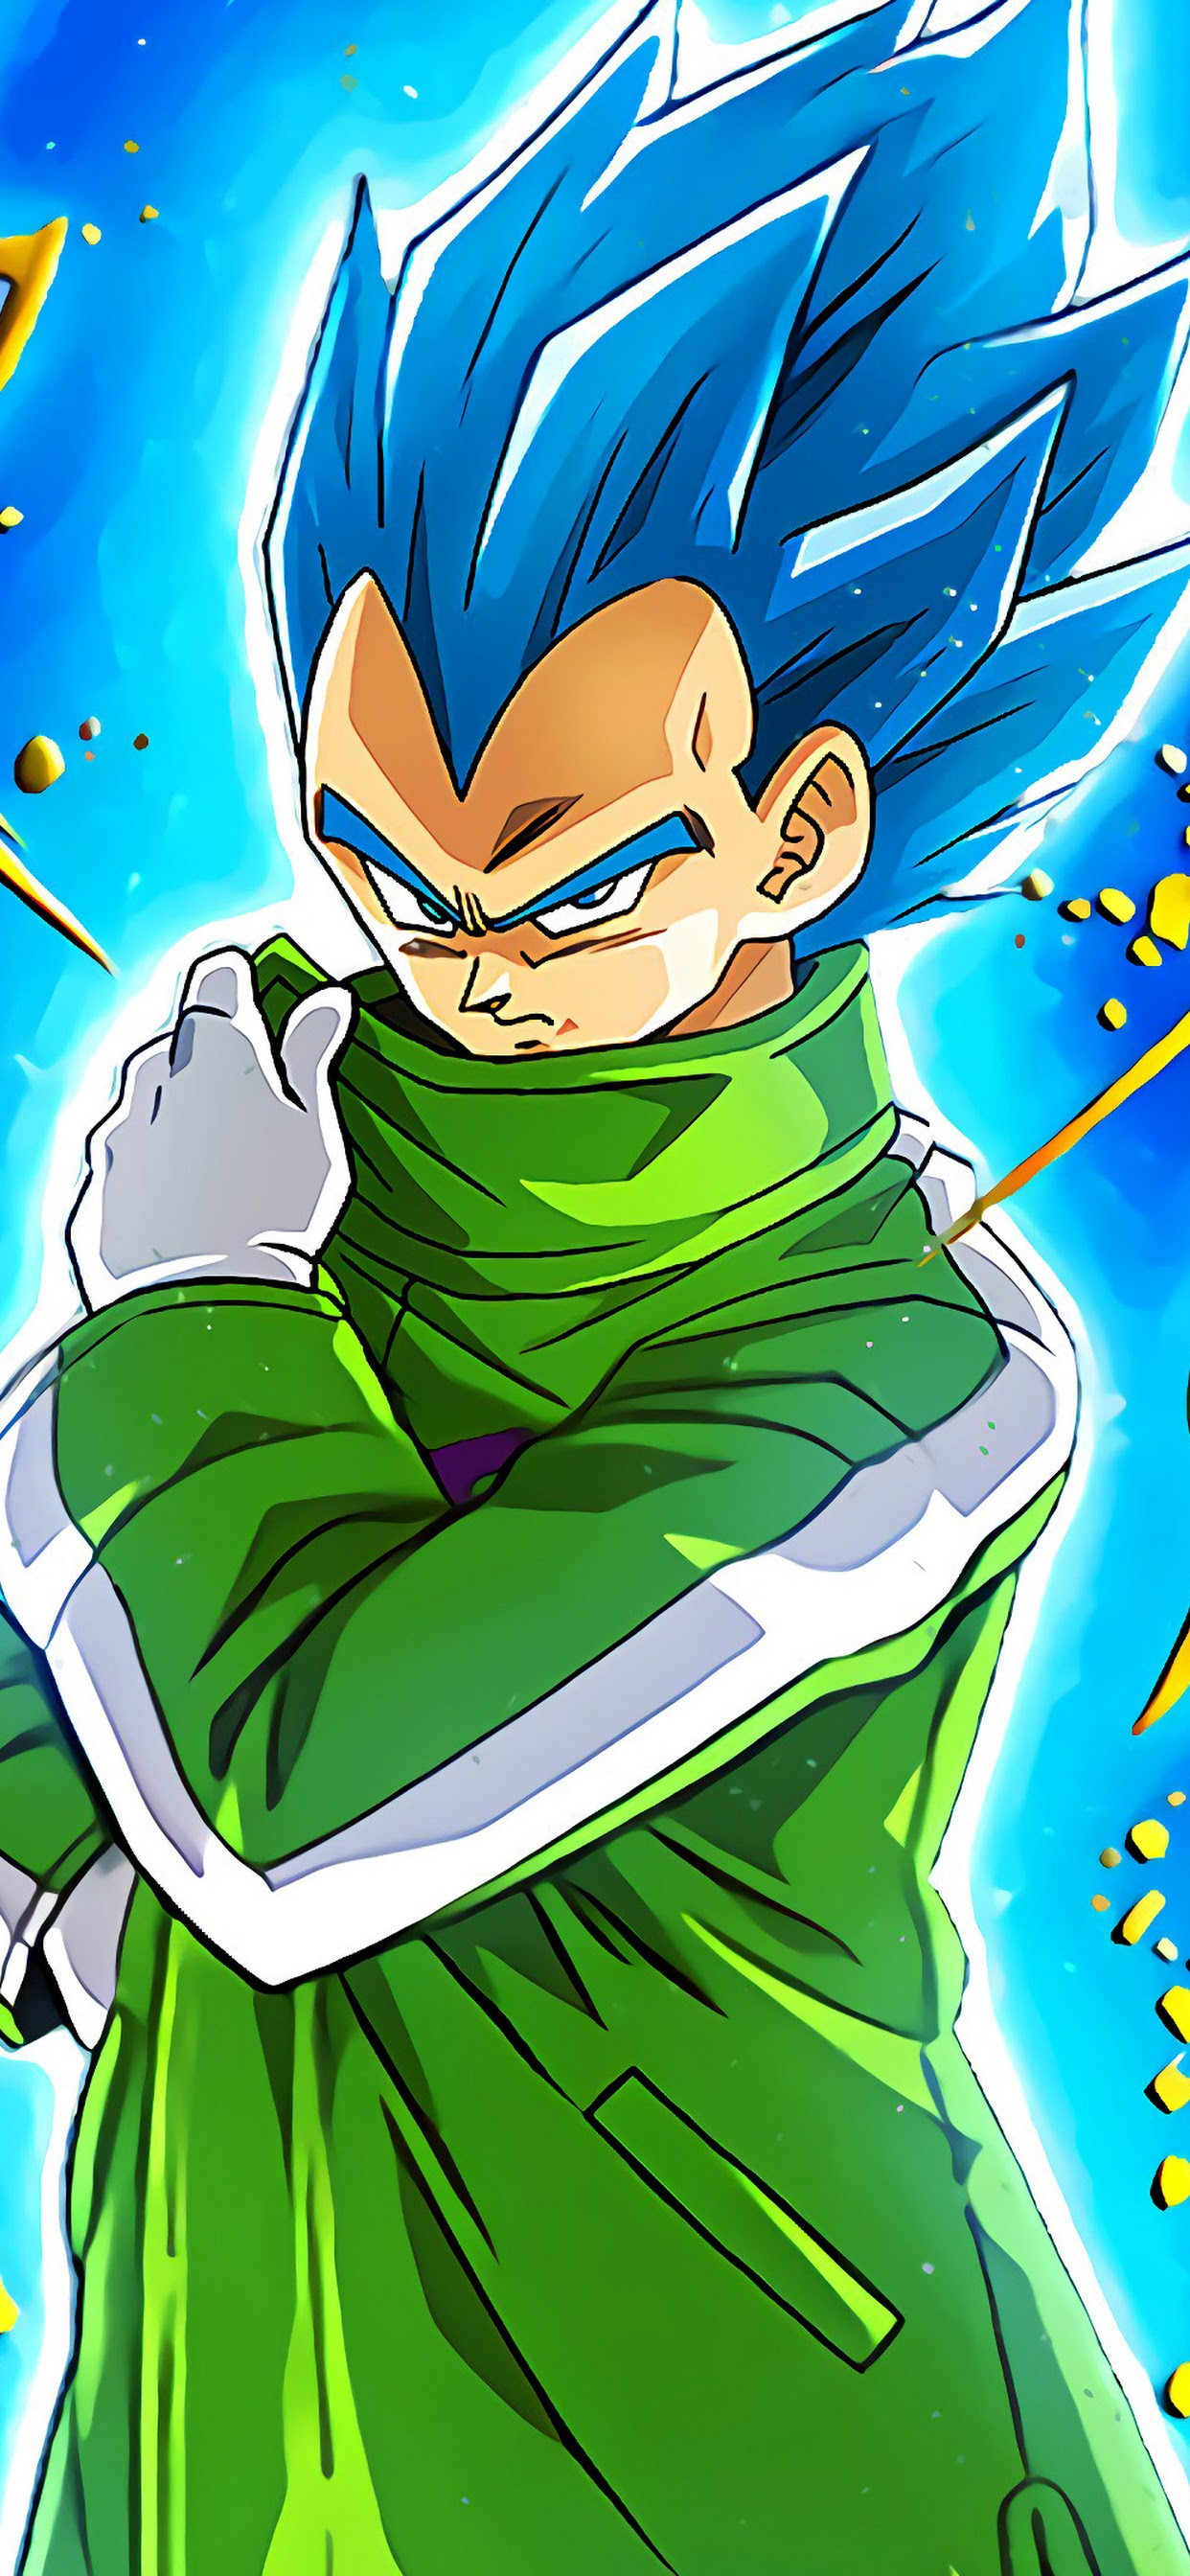 Super Saiyan Blue Vegeta Dragon Ball Super Broly 4k Wallpaper 13